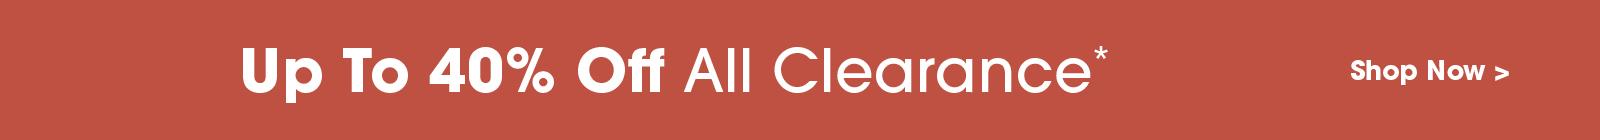 WDTAU_105648 AEOS Wk34 Up To 40% Off Clearance Website Asset Strip_D2_2.jpg